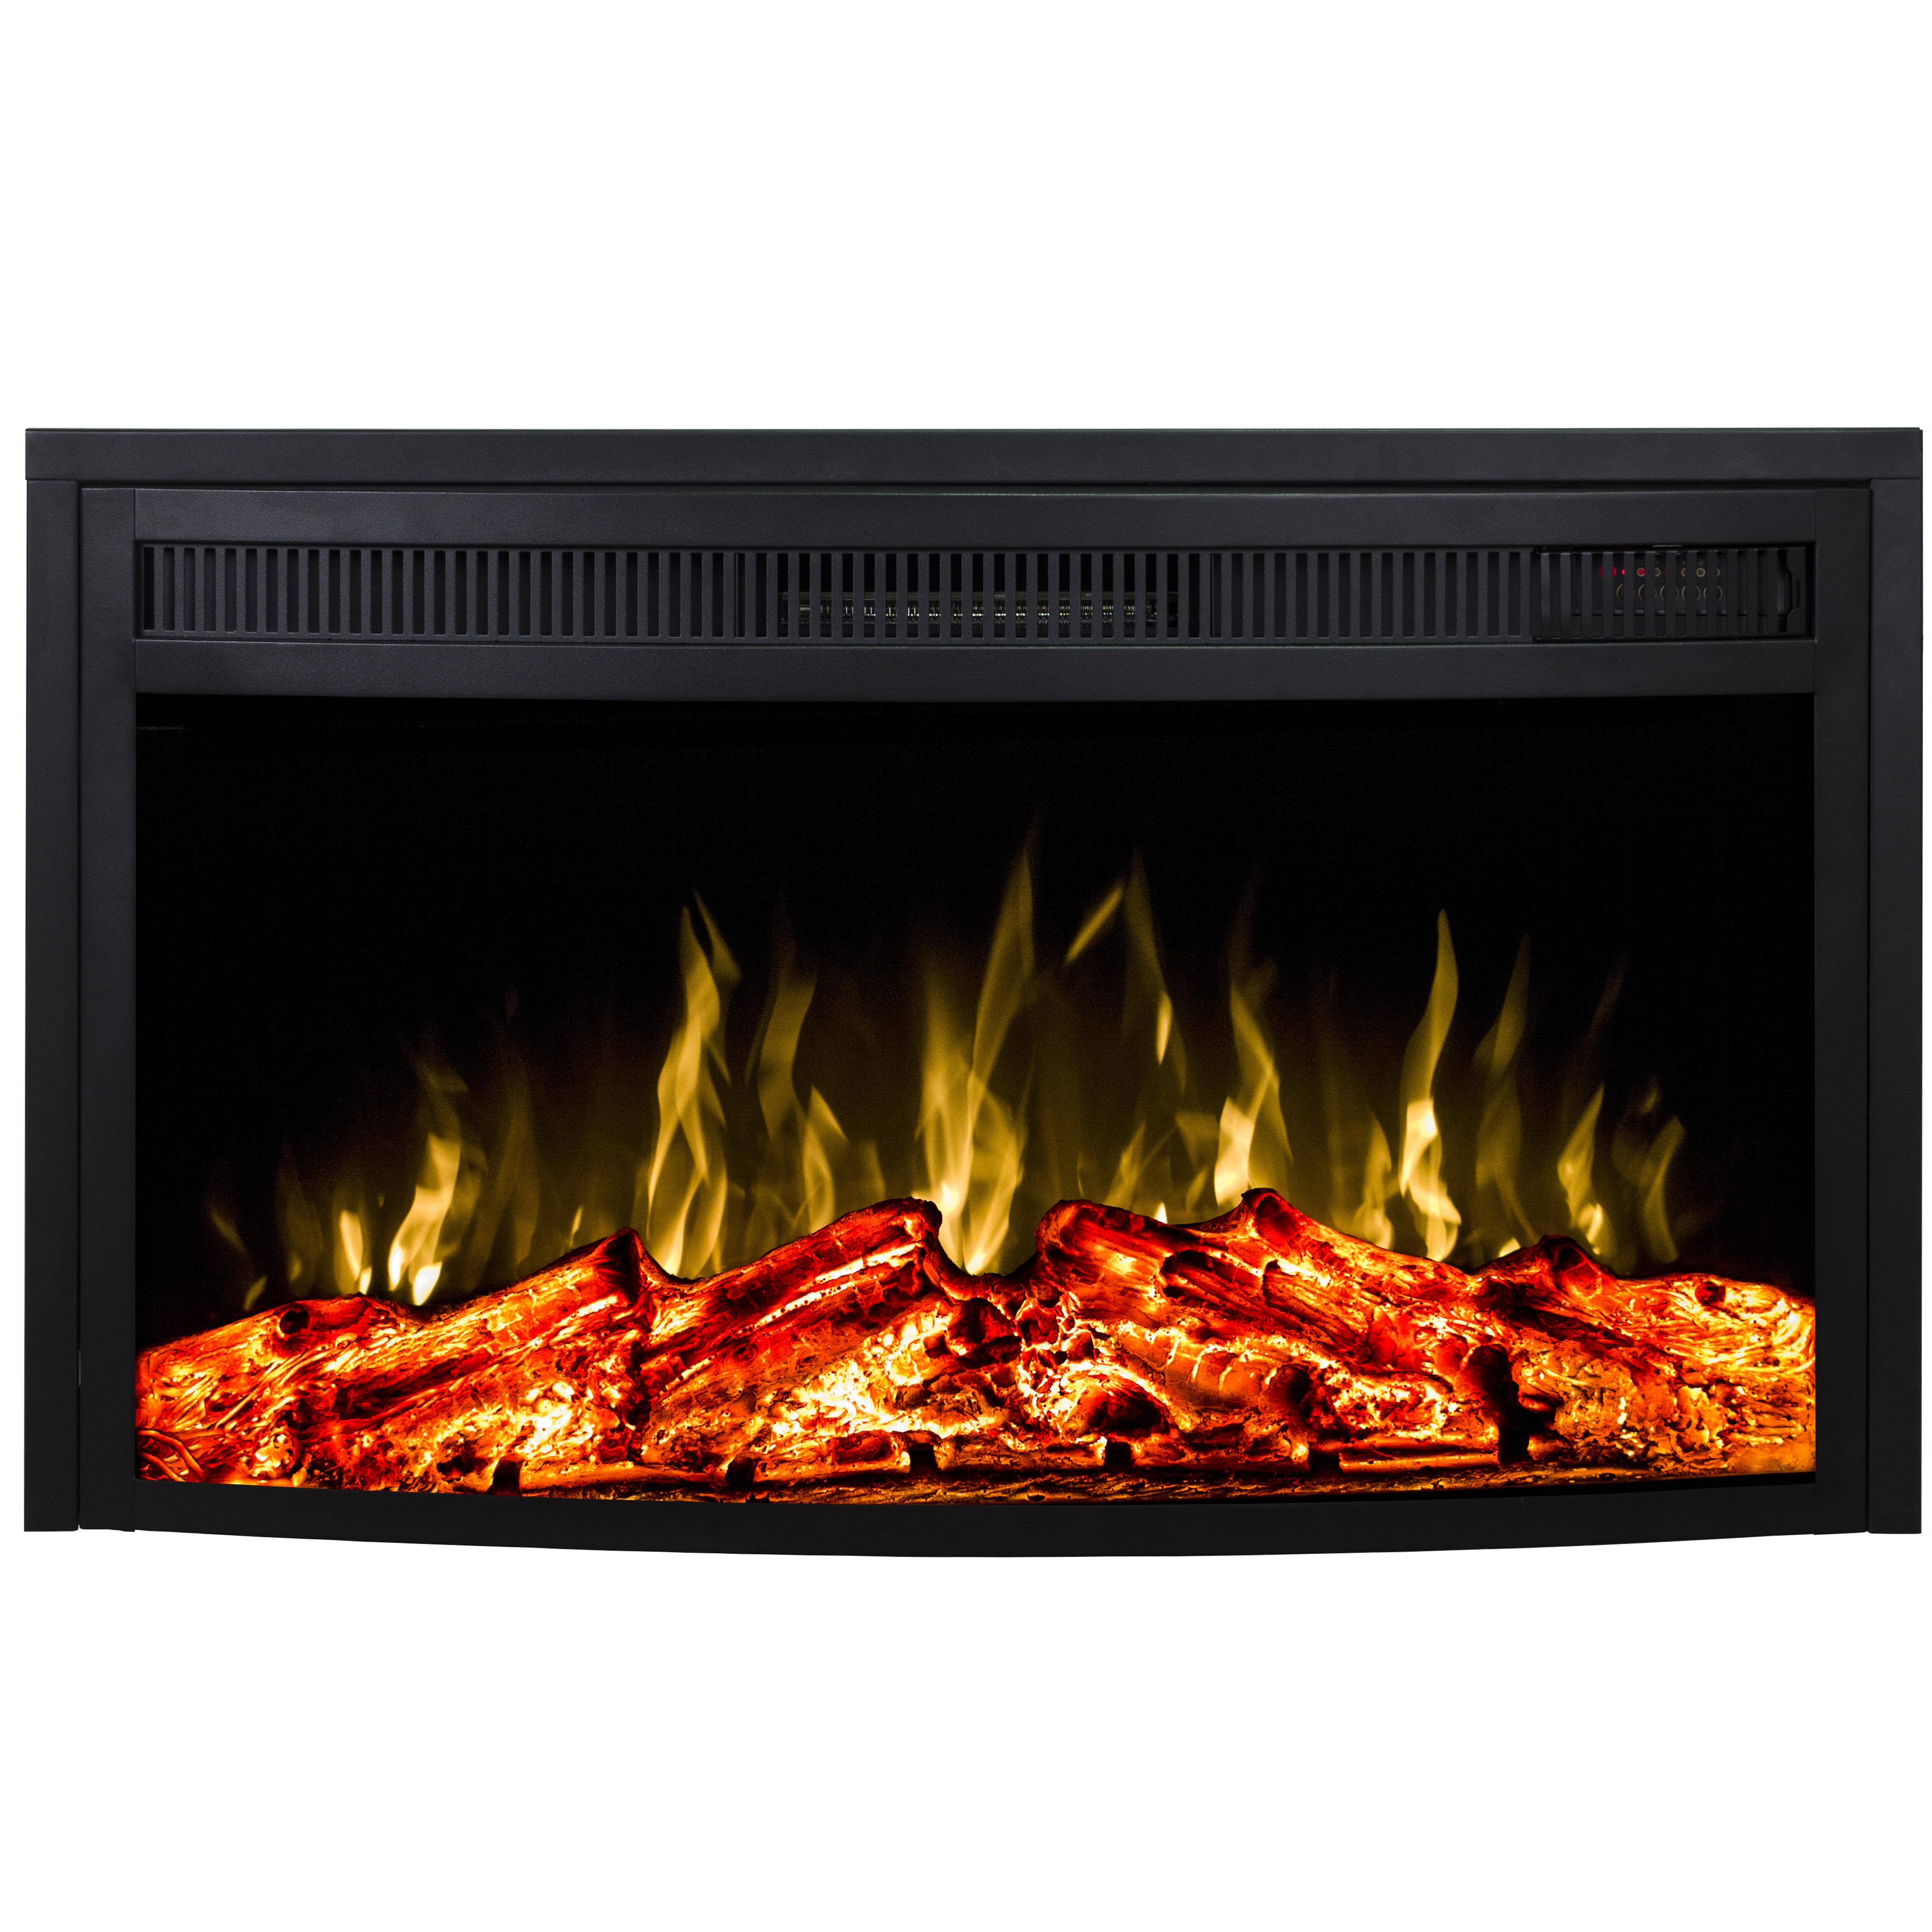 Awe Inspiring 30 Inch Electric Fireplace Insert Interior Design Ideas Inesswwsoteloinfo